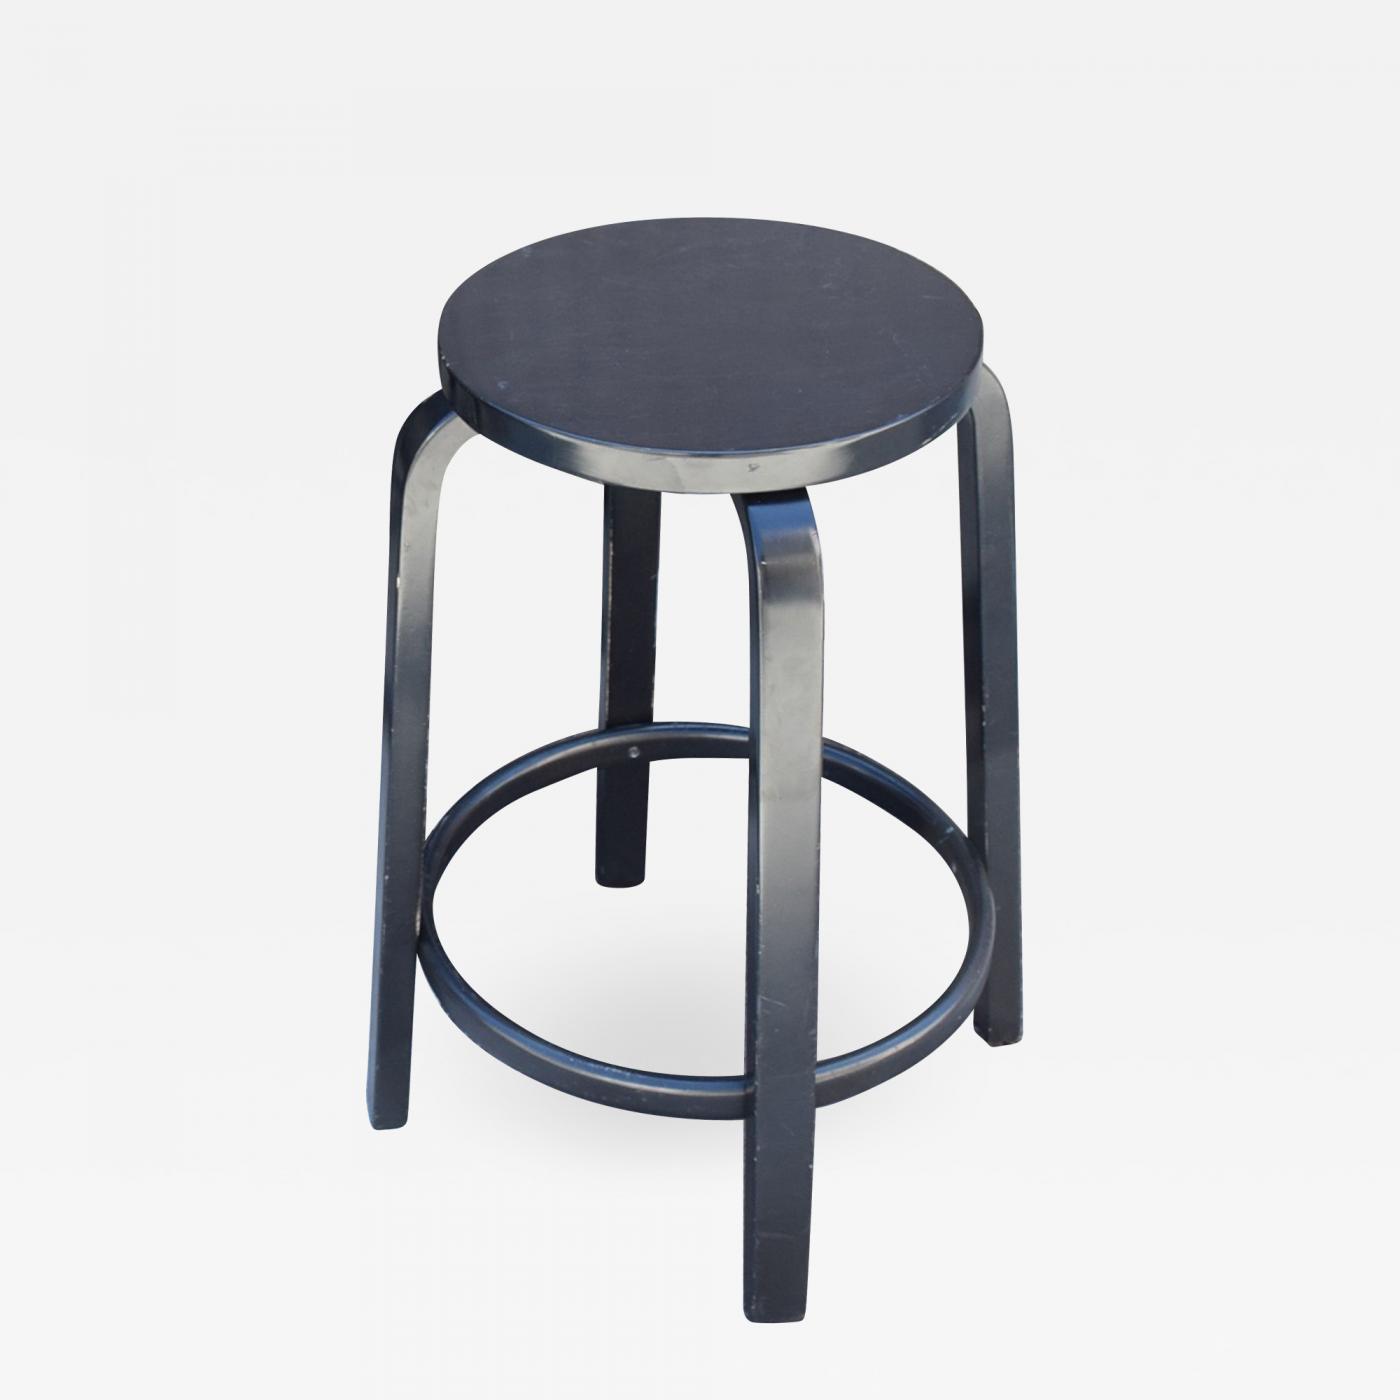 Image of: Alvar Aalto Artek Black Counter Height Bar Stool By Alvar Aalto Modern Finland